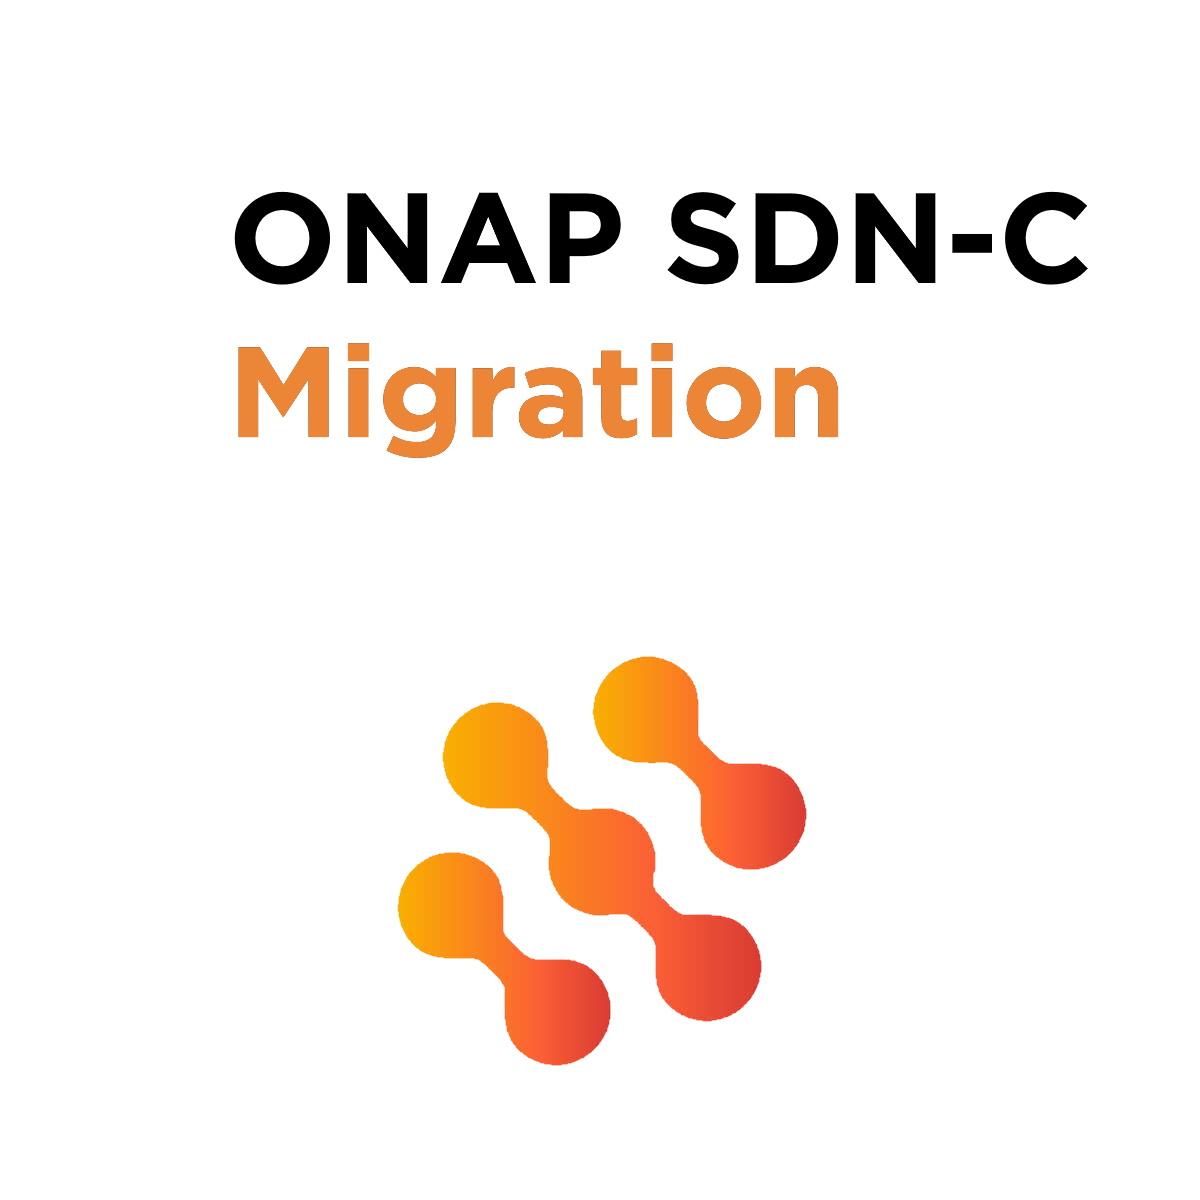 onap_migration_lighty